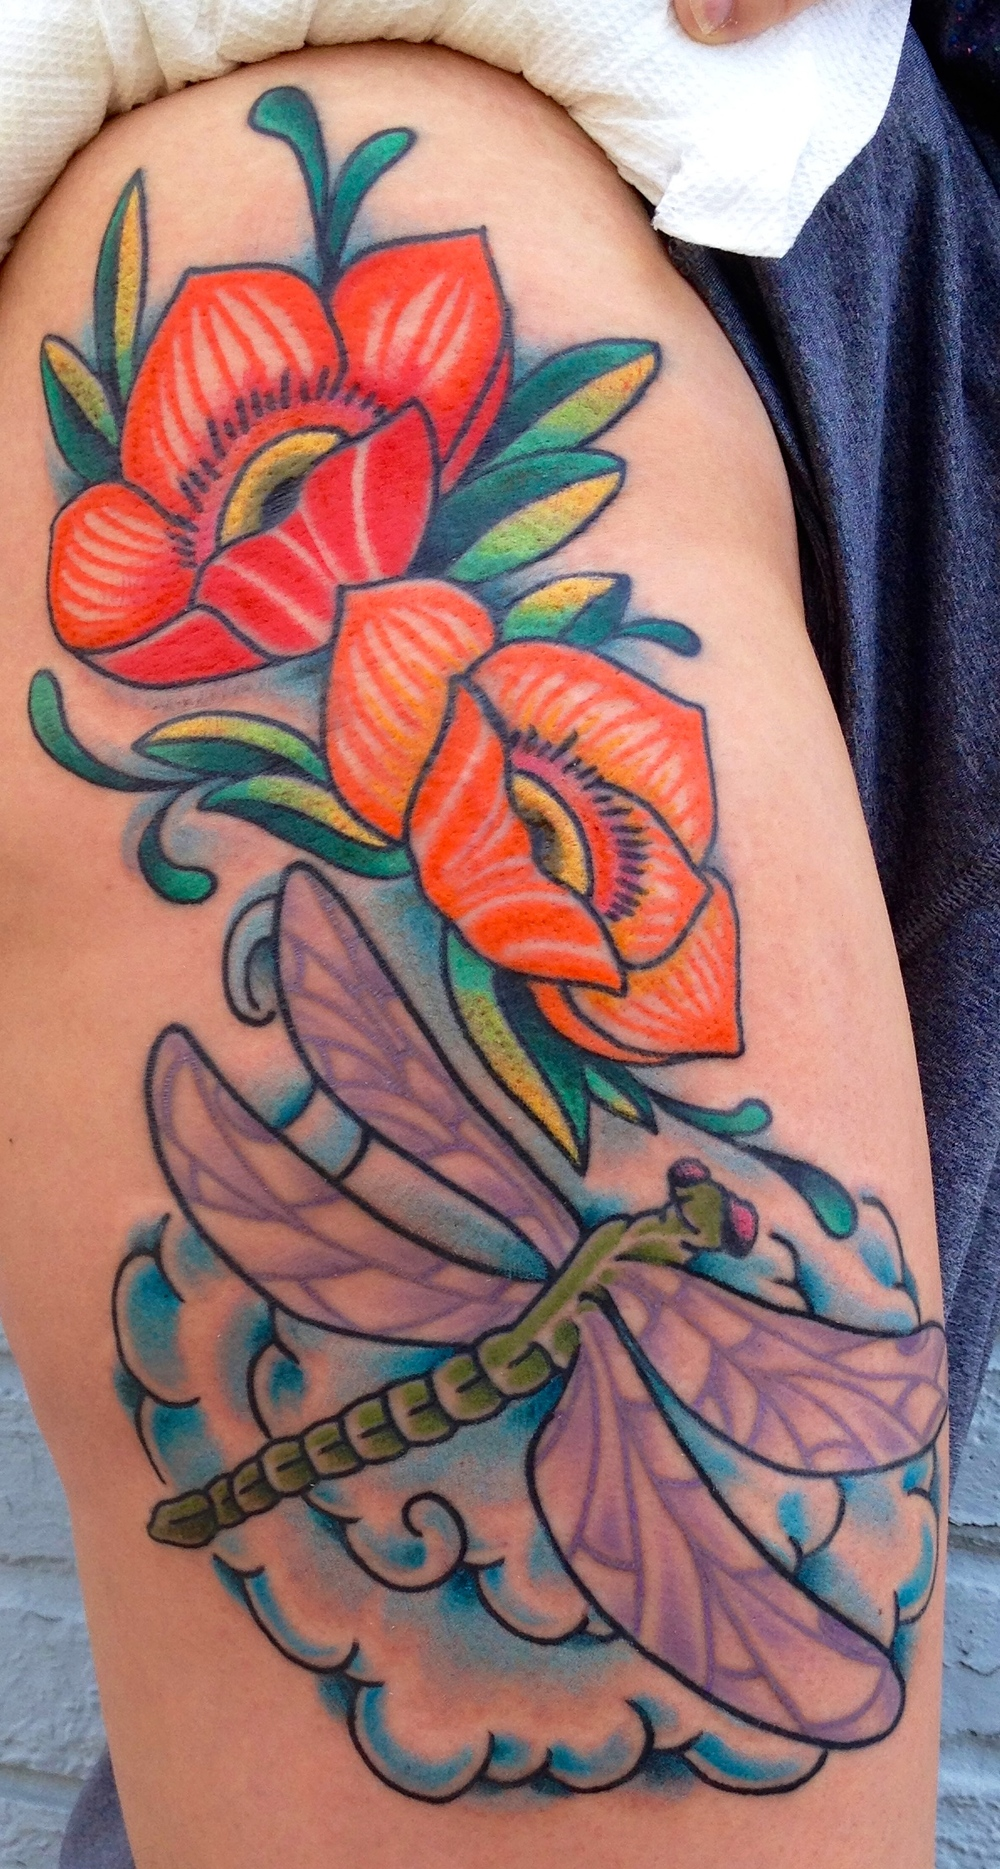 Jae portfolio electric lotus tattoo beautiful flower tattoos bright color tattooingnbspelectric lotus tattoo fort greene brooklyn izmirmasajfo Gallery